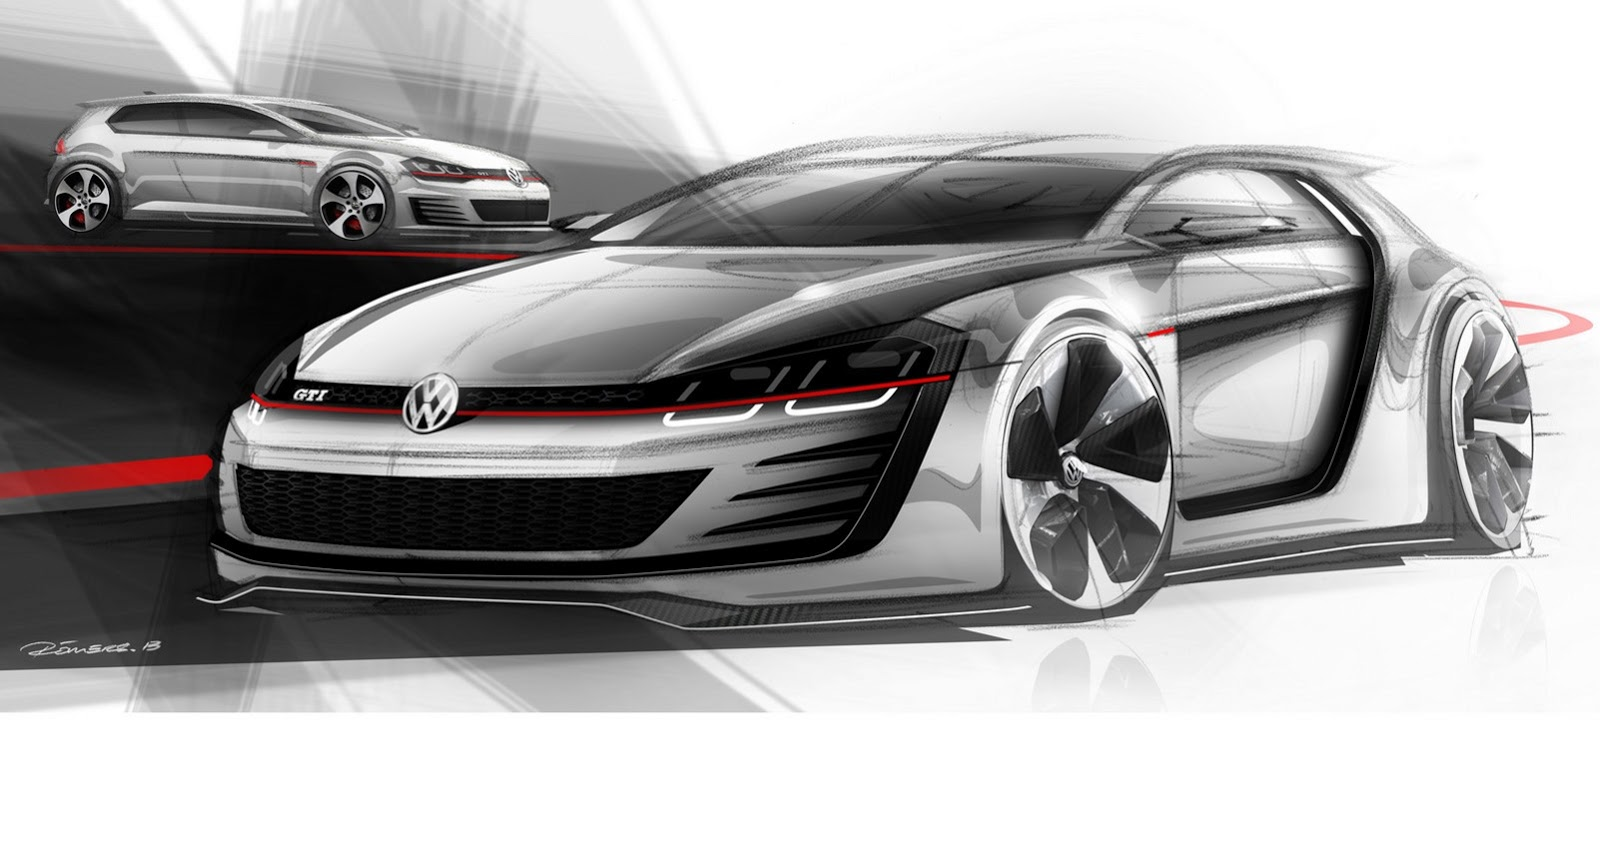 volkswagen_design_vision_gti_concept_sketch_01